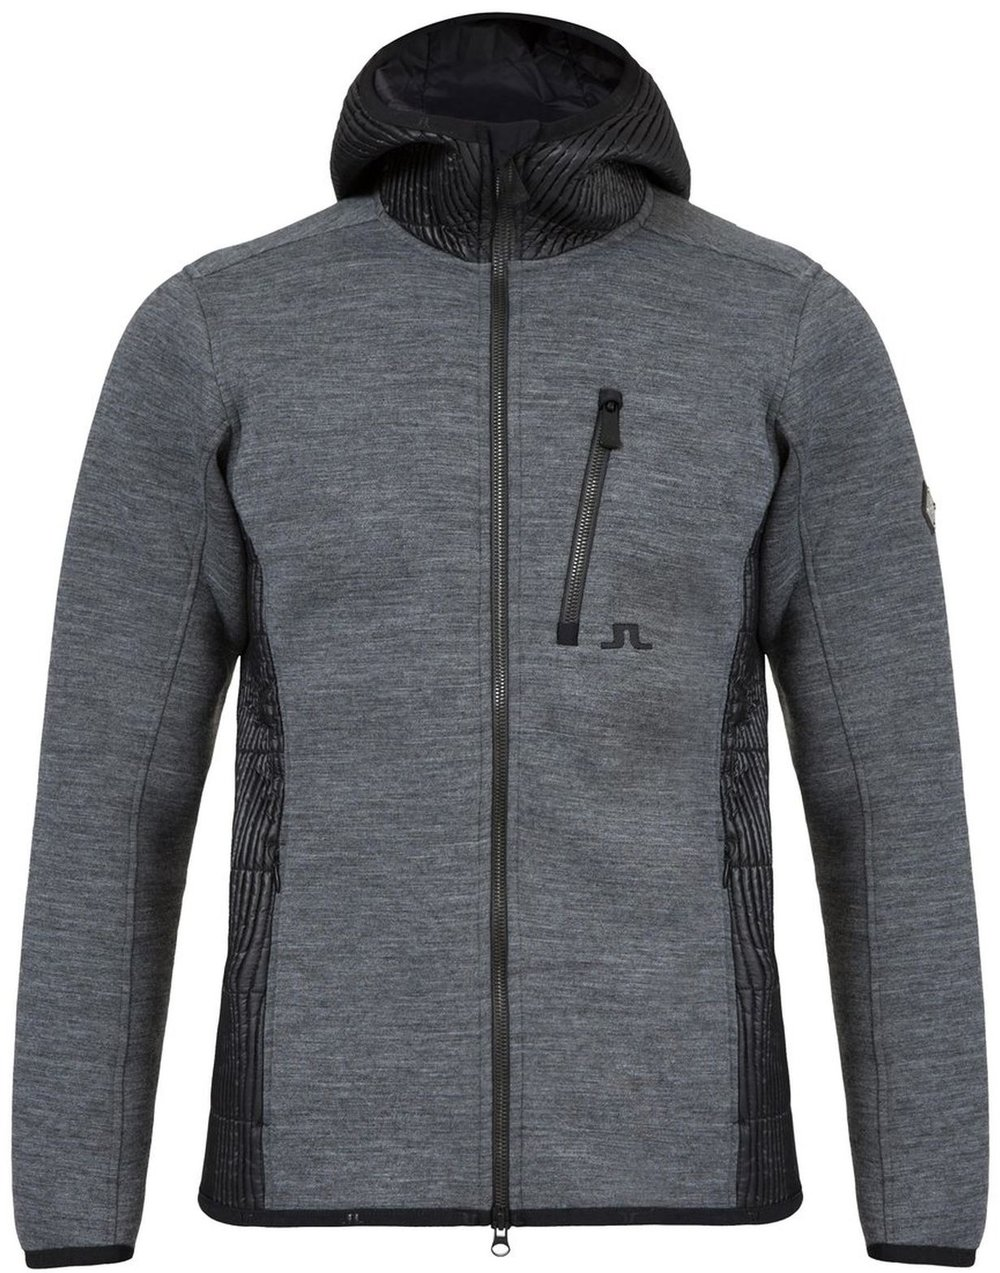 J.Lindeberg Regal Mid Techno Jersey Jacket, £210